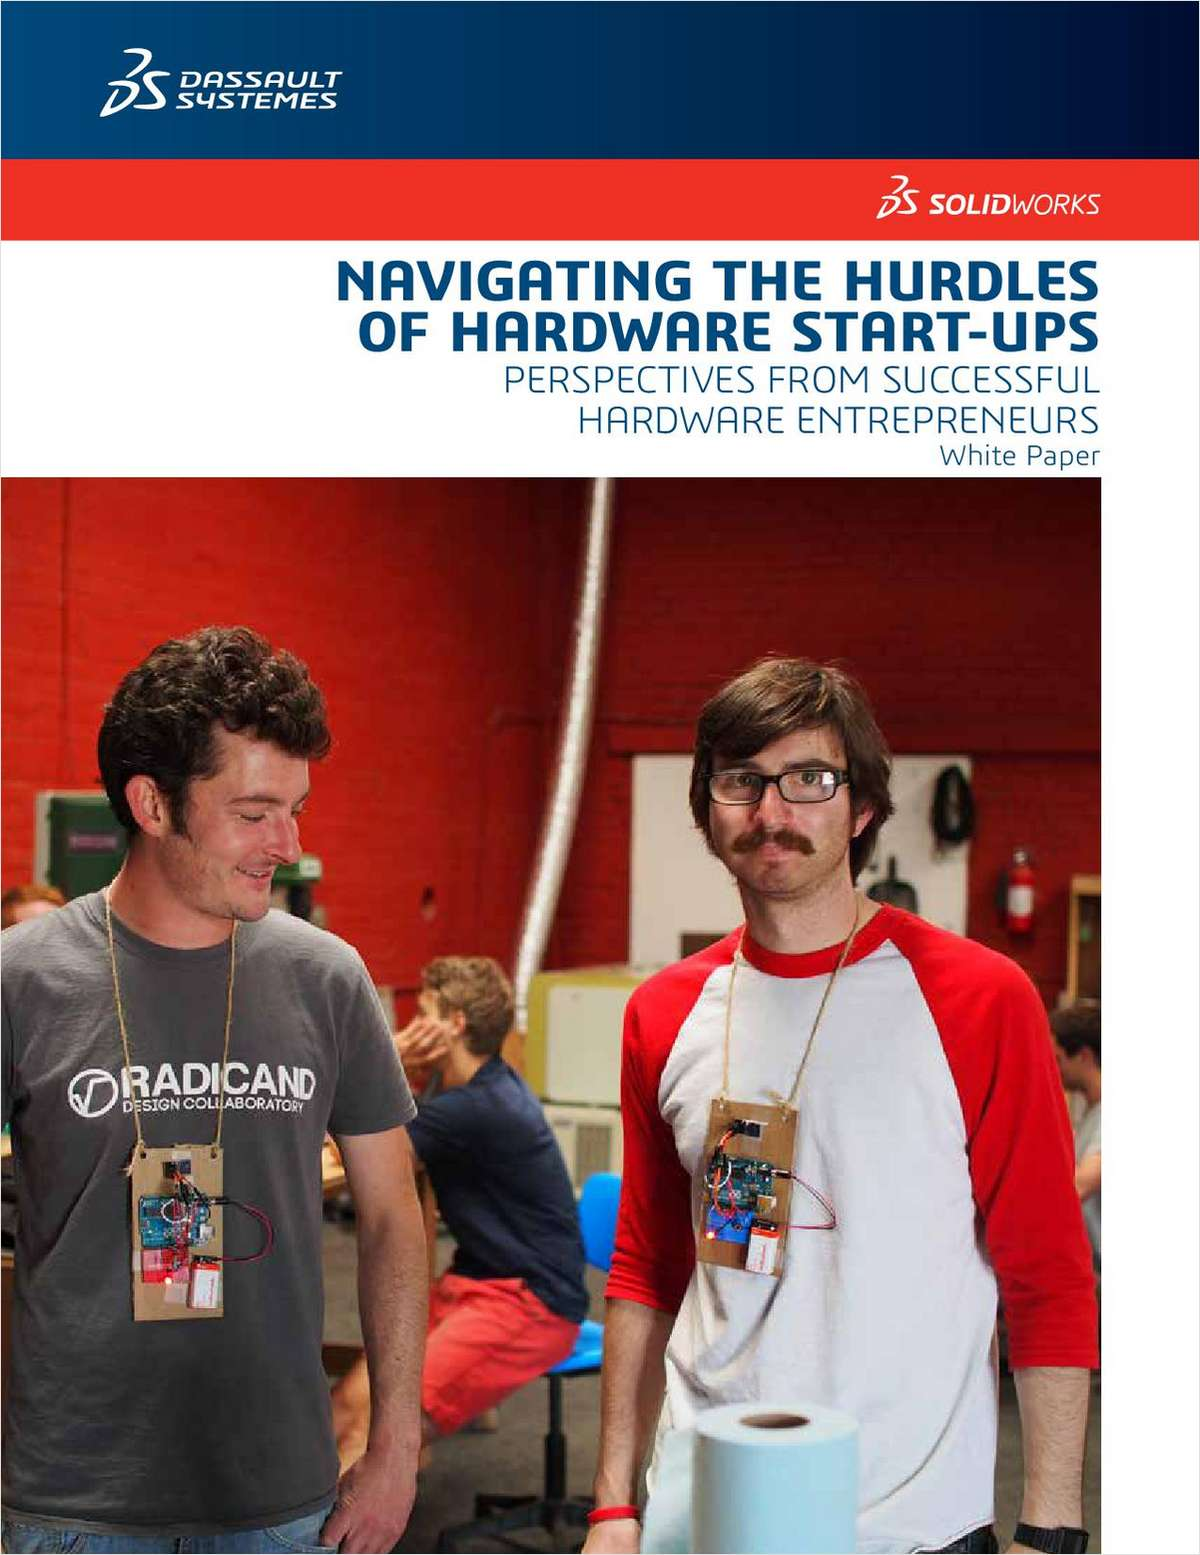 Navigating The Hurdles of Hardware Start-Ups